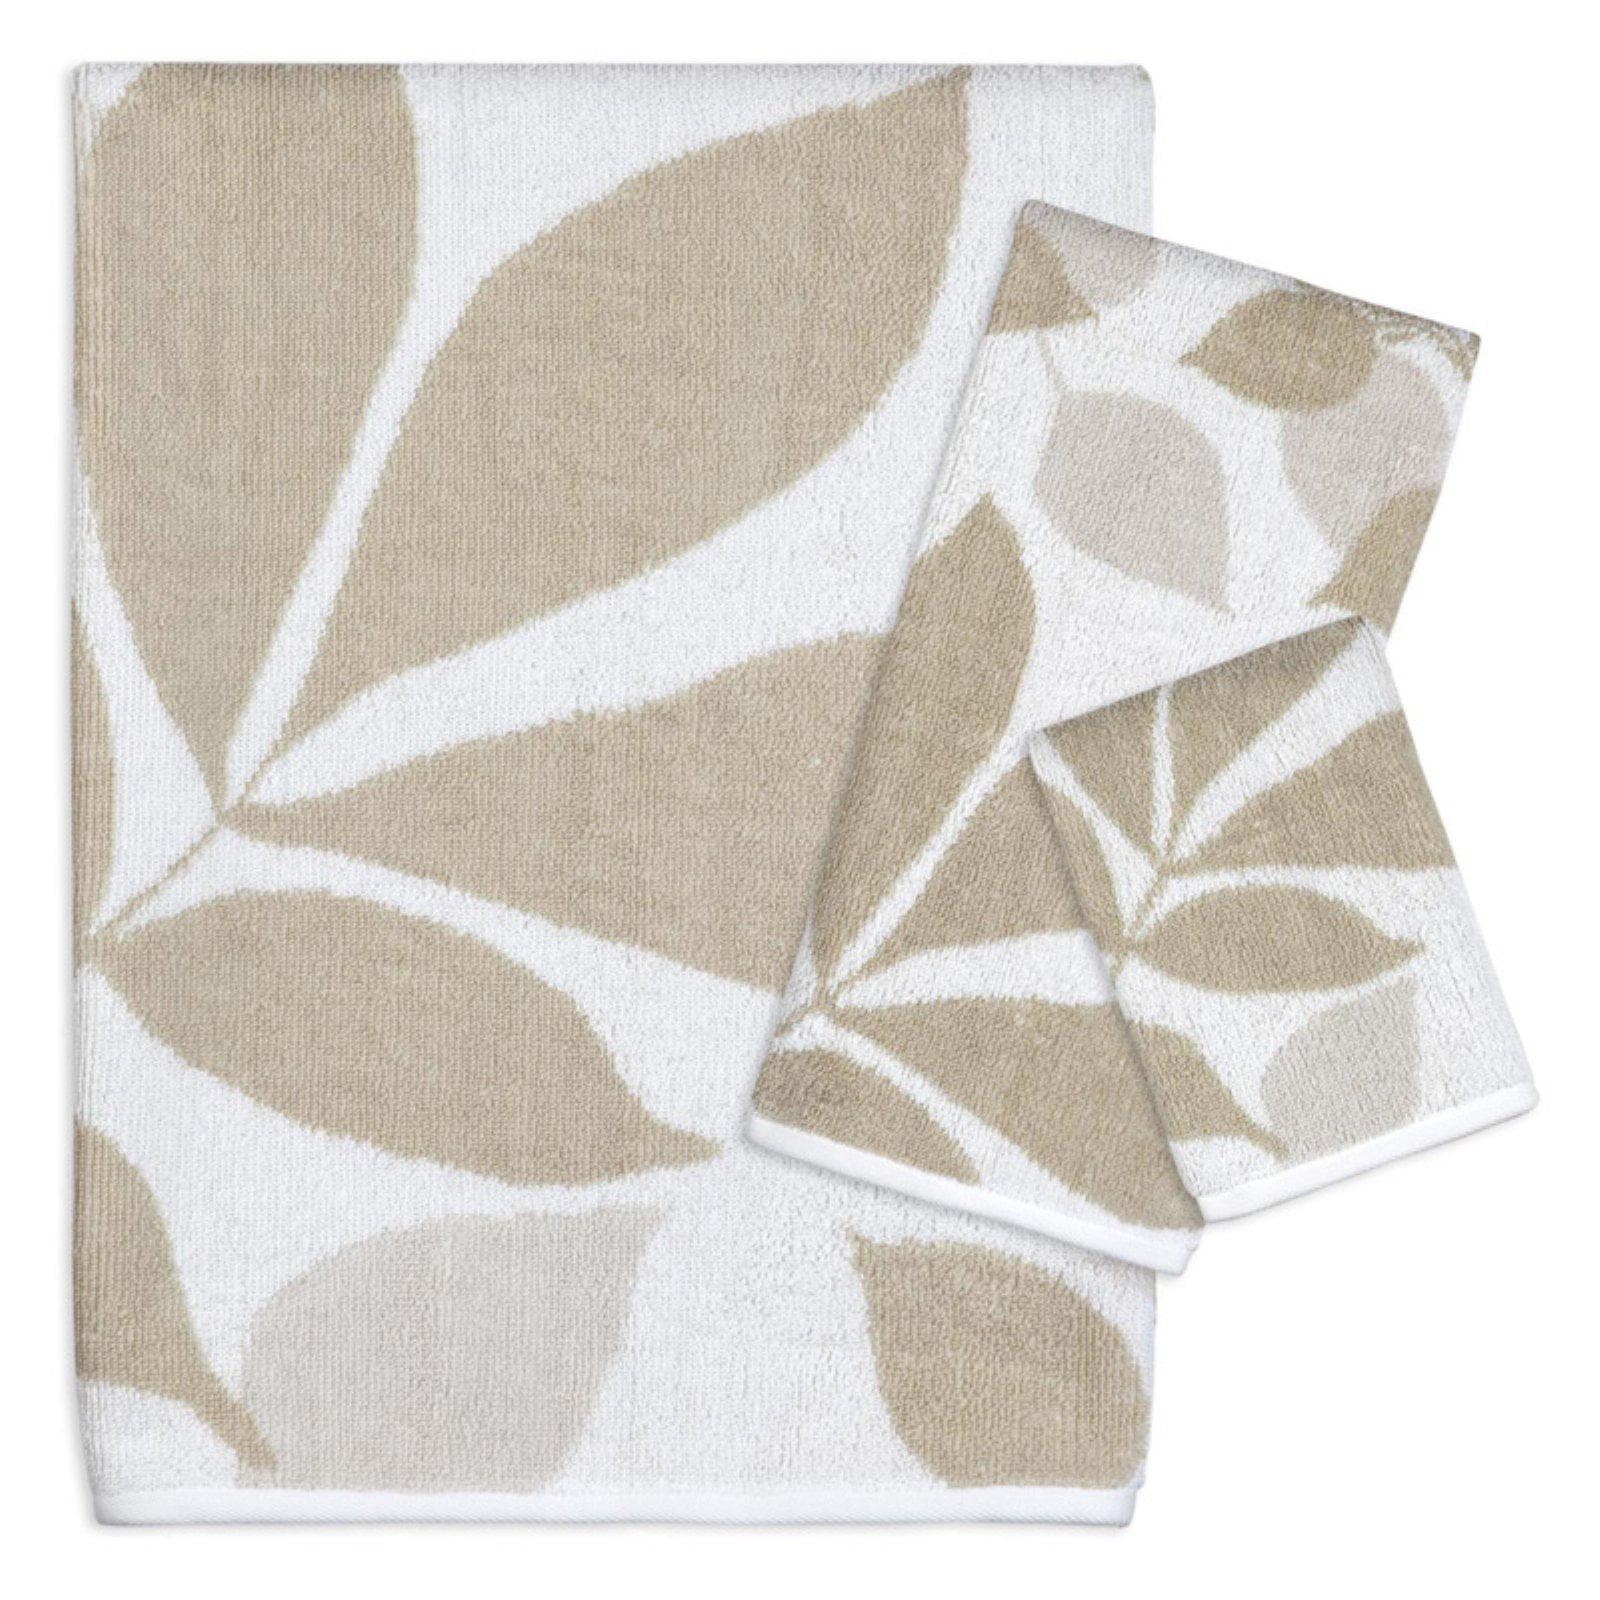 Creative Bath Shadow Leaves 100% Cotton 3 Piece Bath Towel Set by Creative Bath Products Inc